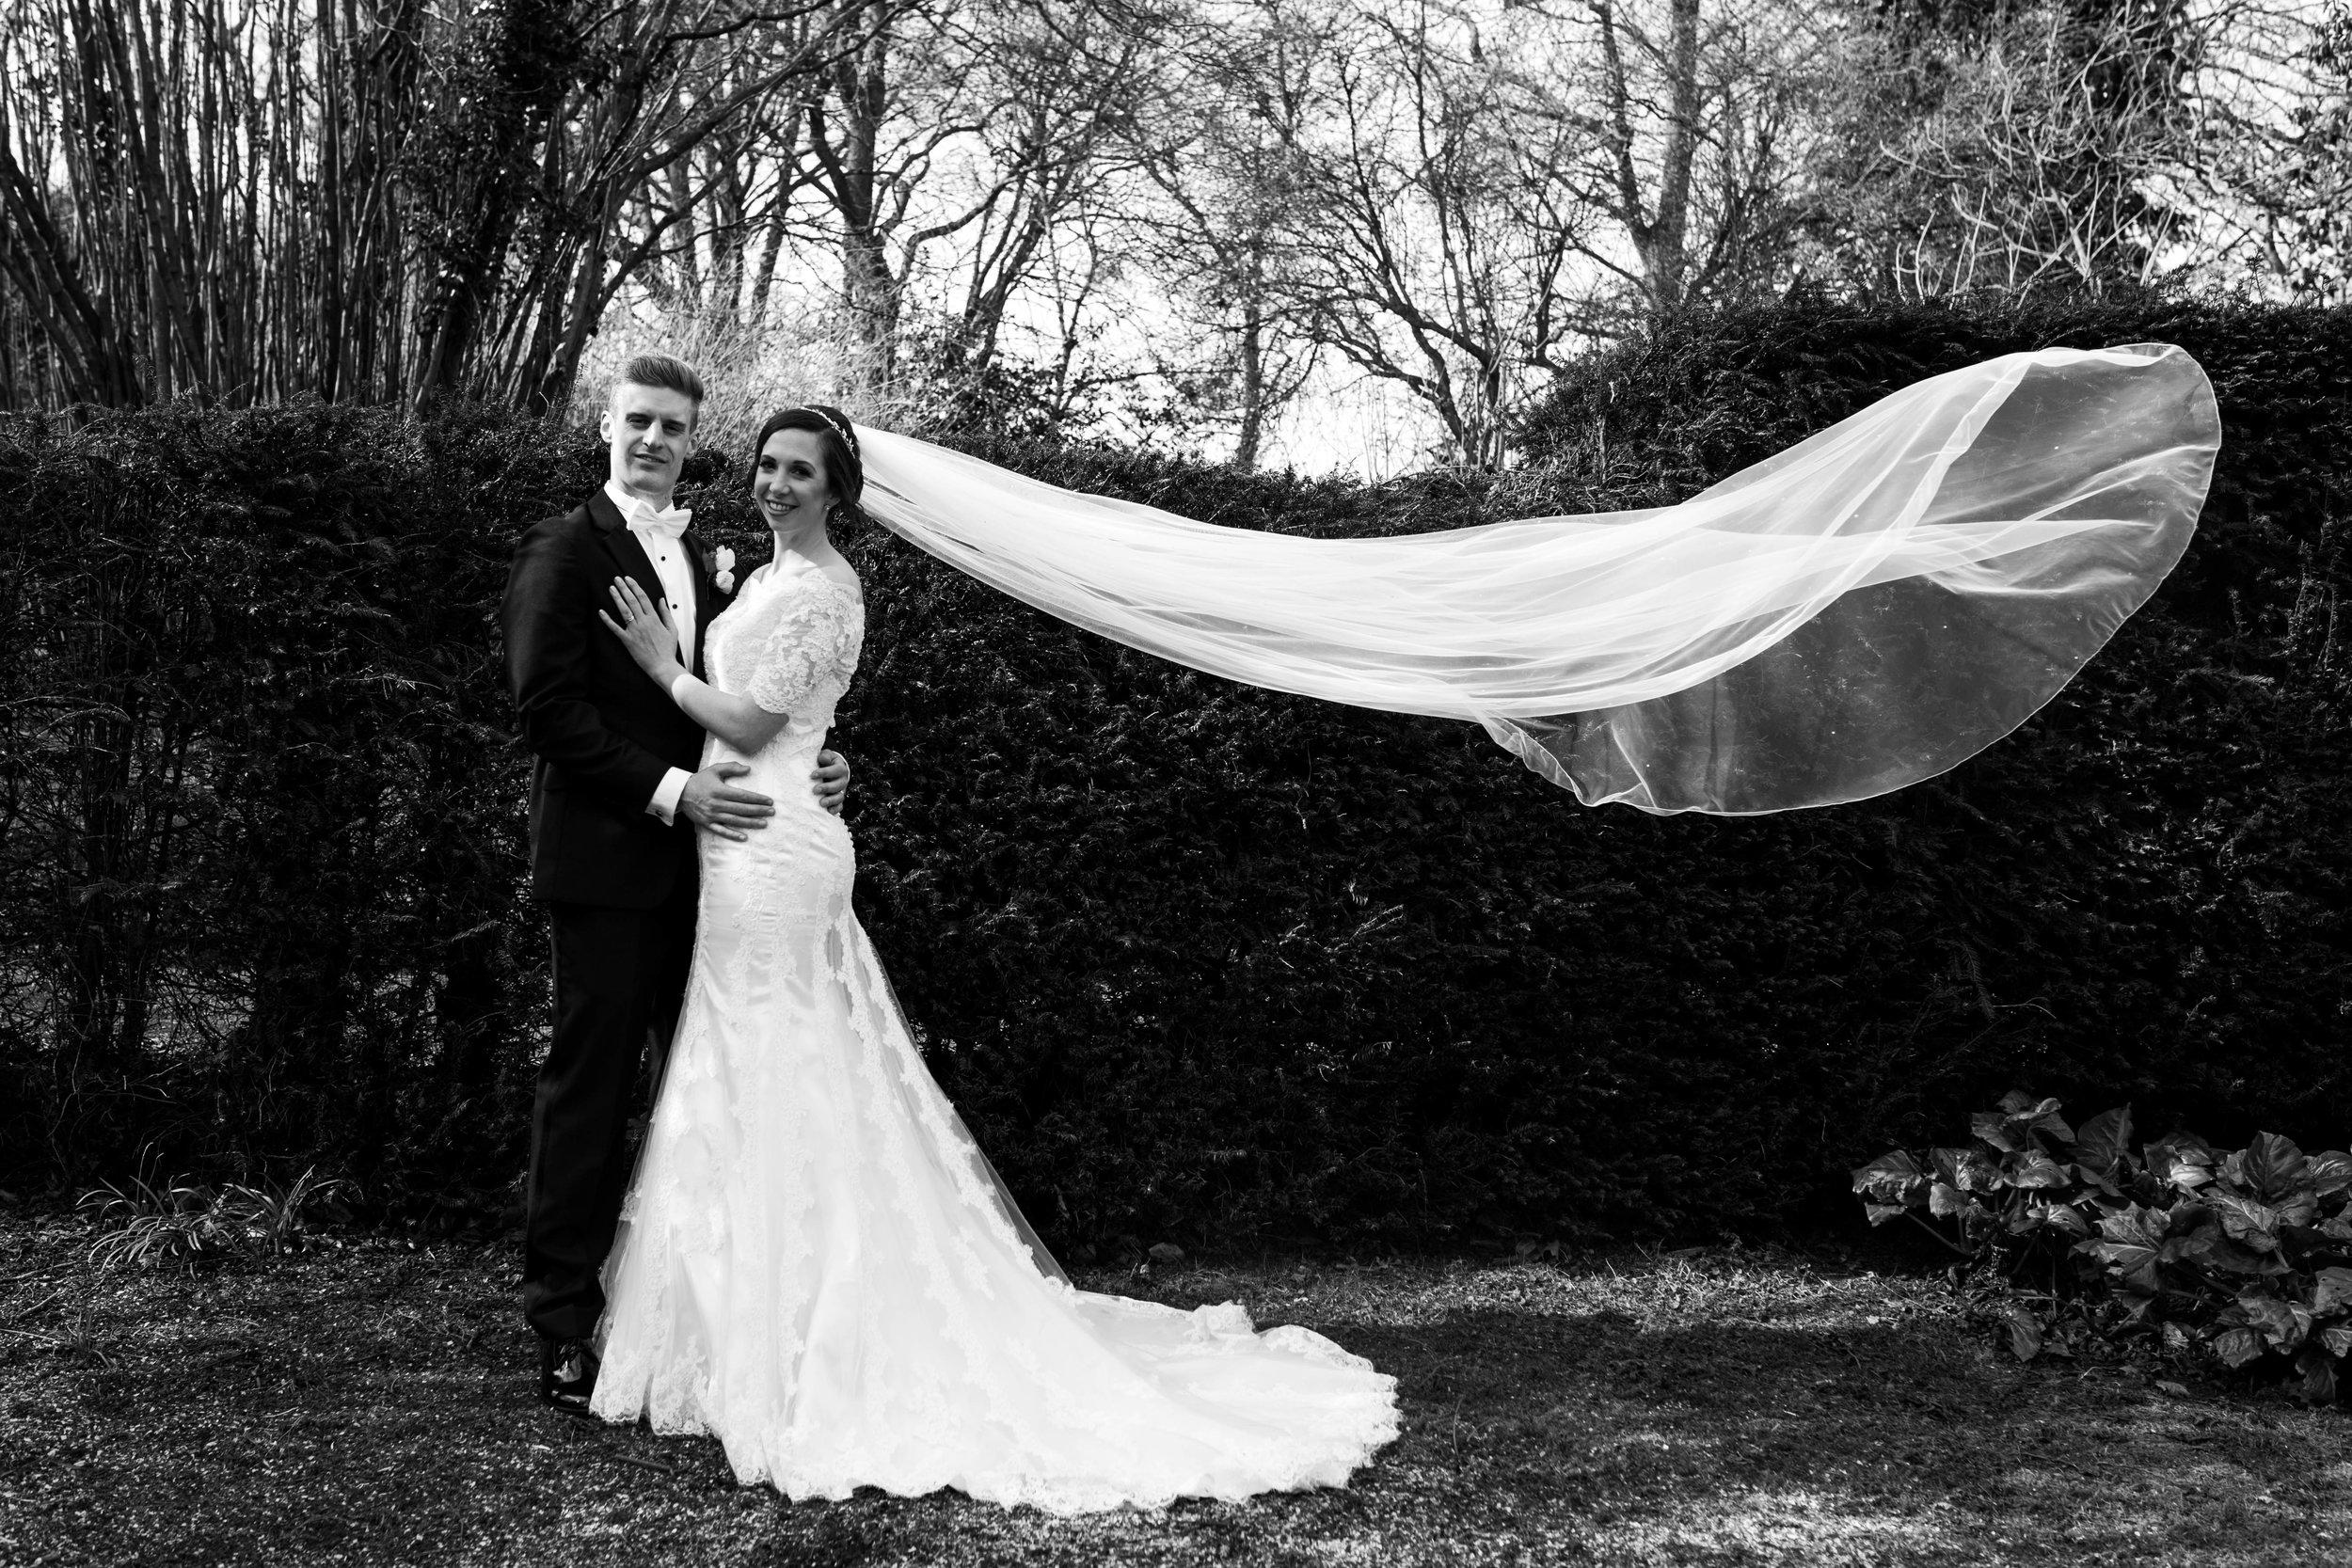 Notley_Abbey_Nick_Labrum_Photo_Kate&Matt_black and white-398.jpg